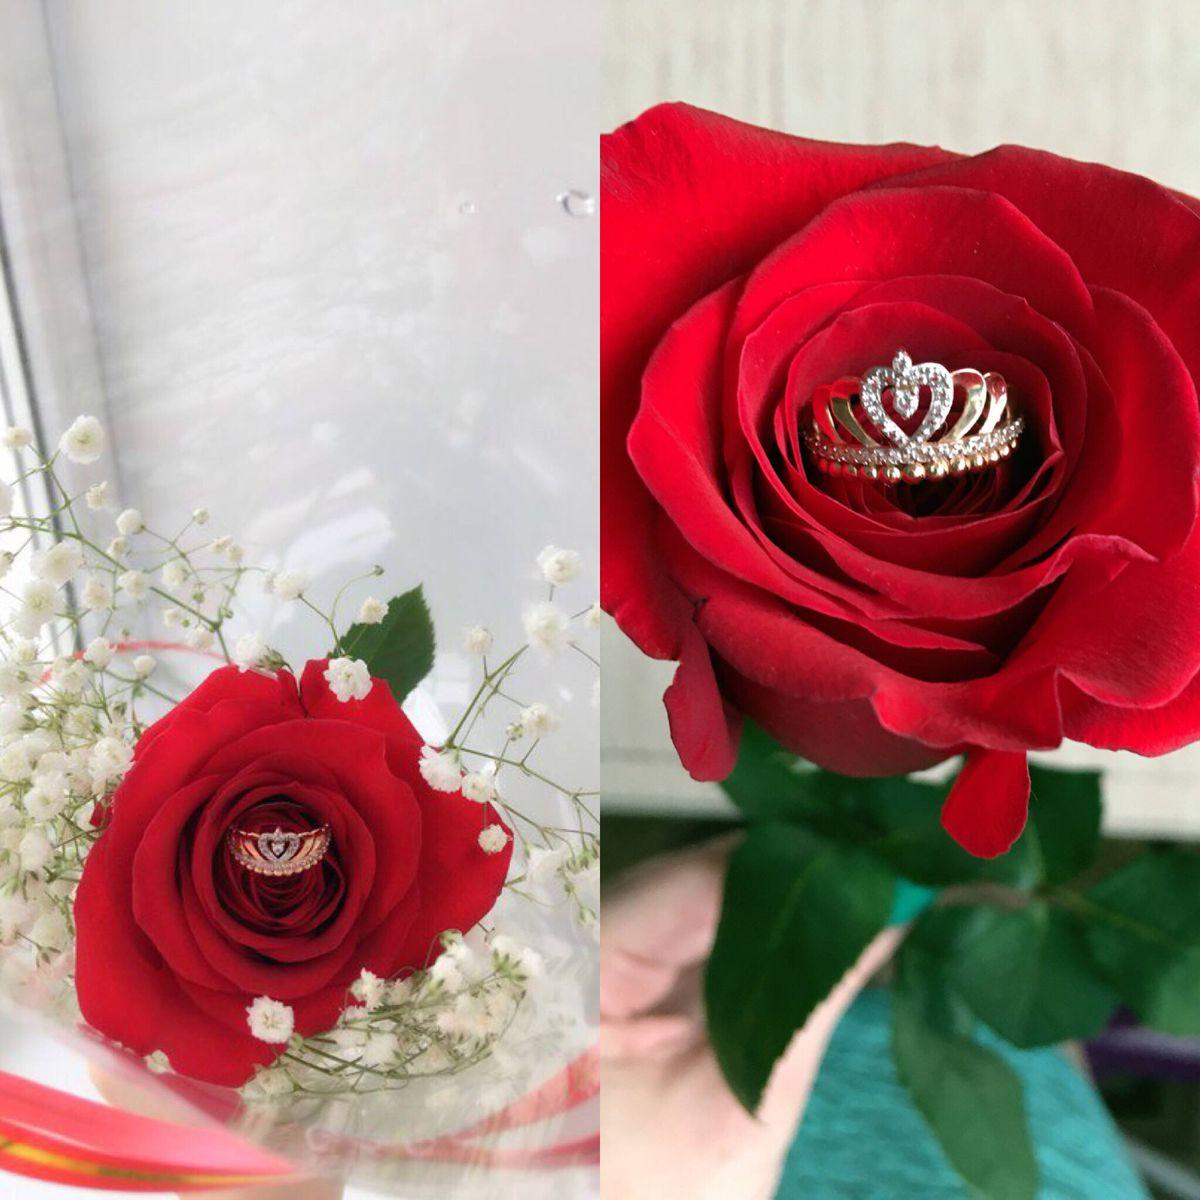 Подарок от любимого мужа на 14 февраля